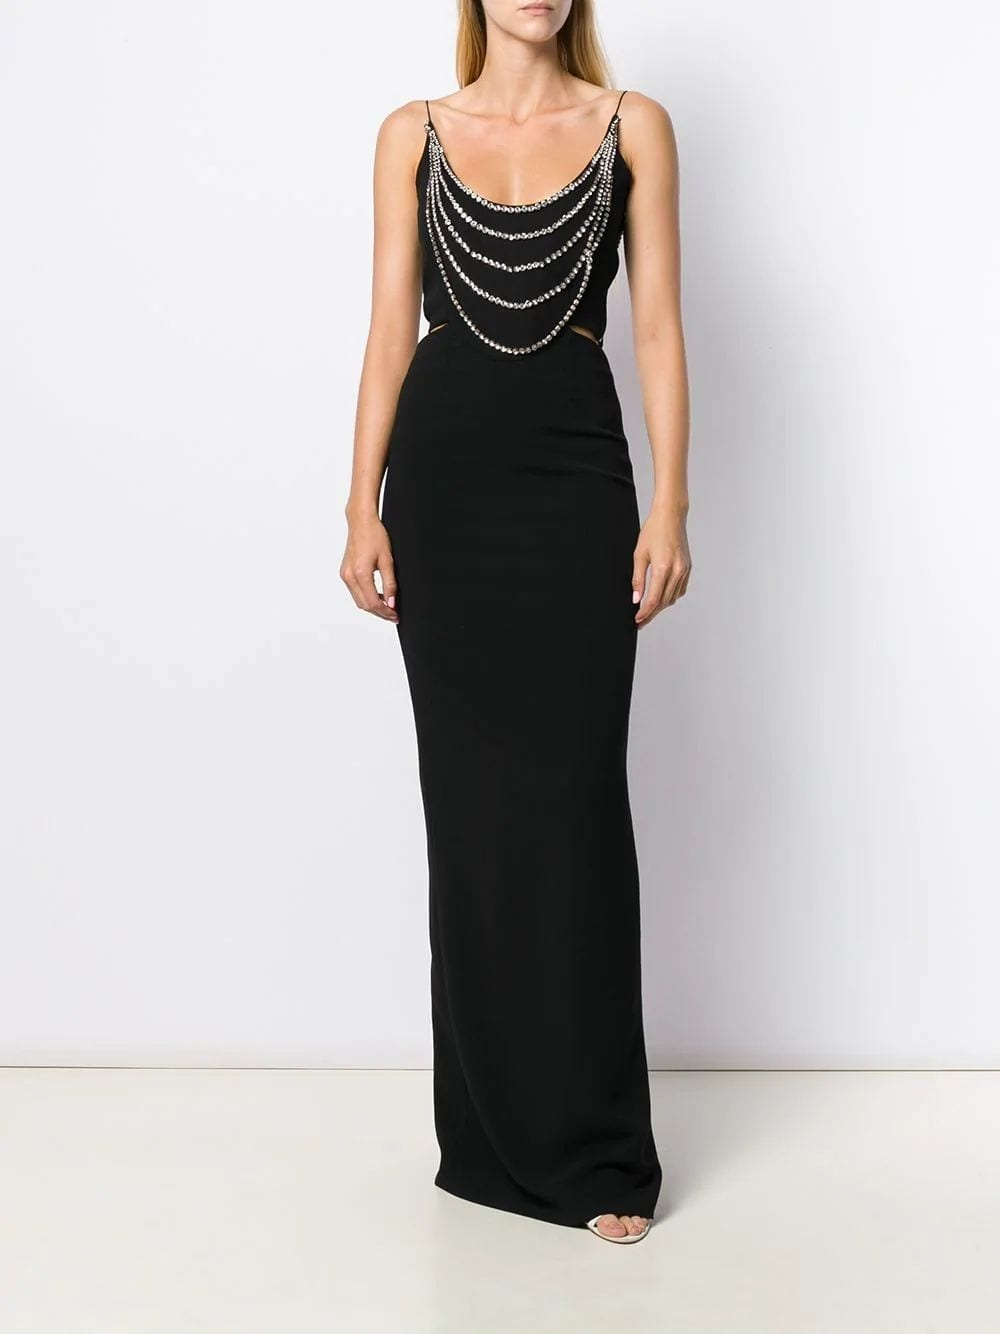 STELLA MCCARTNEY Black Crystal Embellished Gown